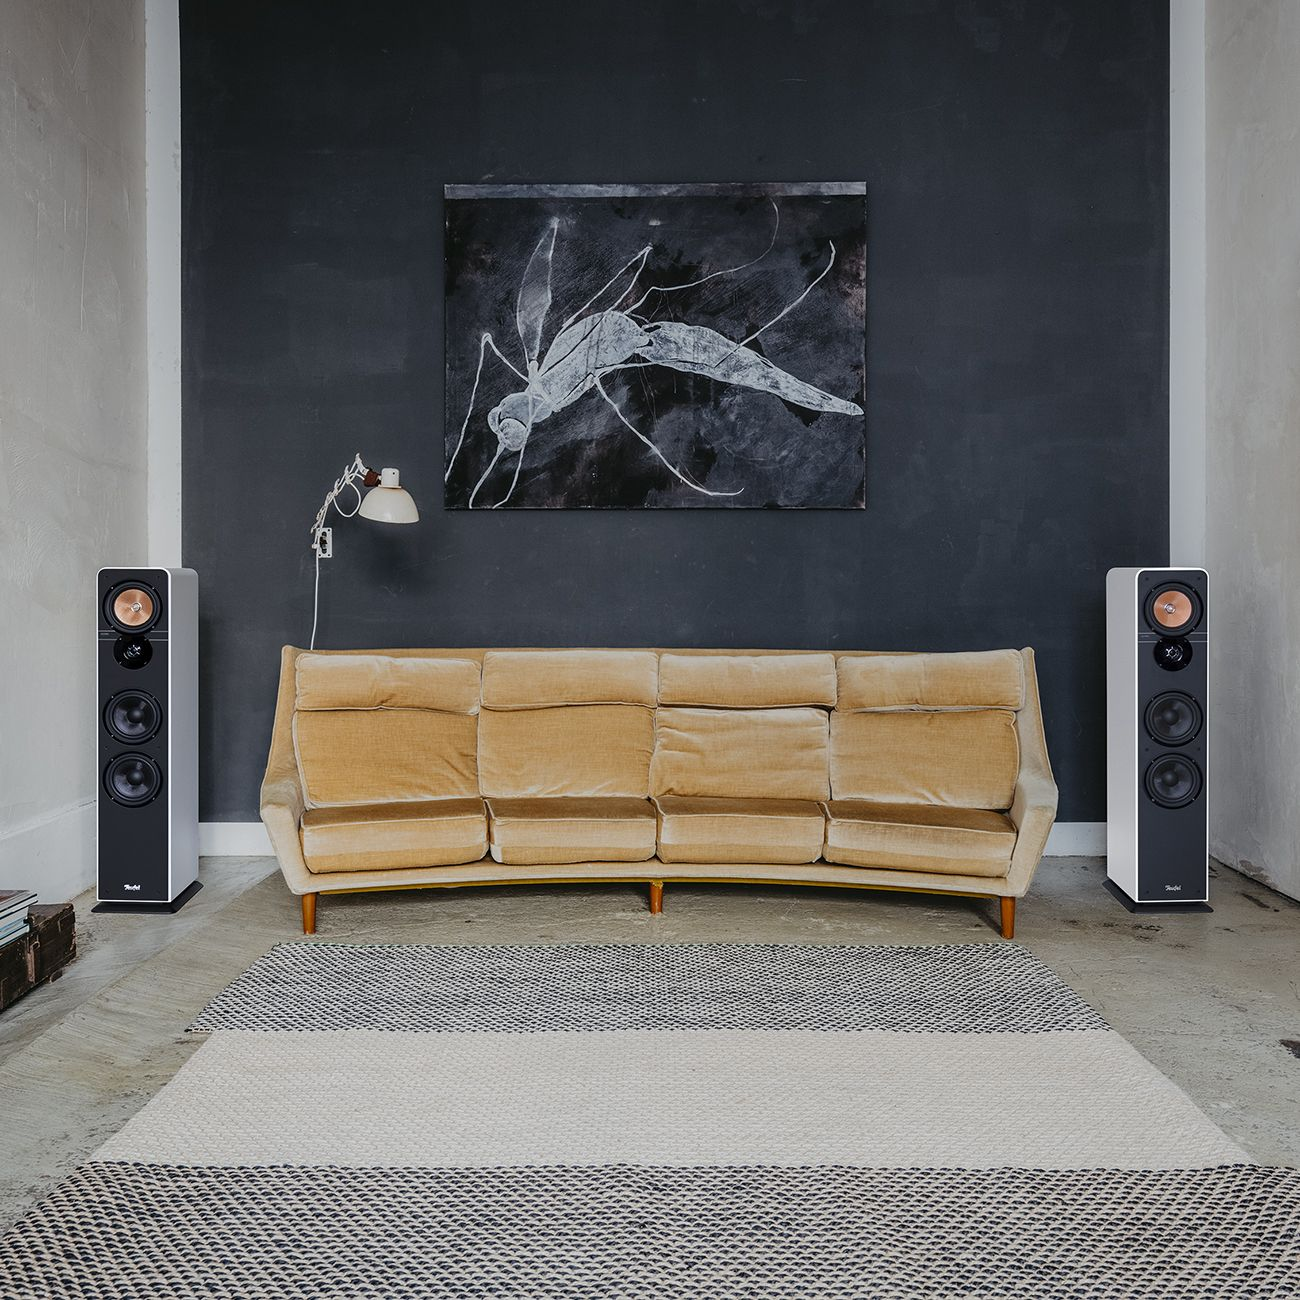 Ultima 40 Mit Bildern Standlautsprecher Lautsprecher Stereo Lautsprecher